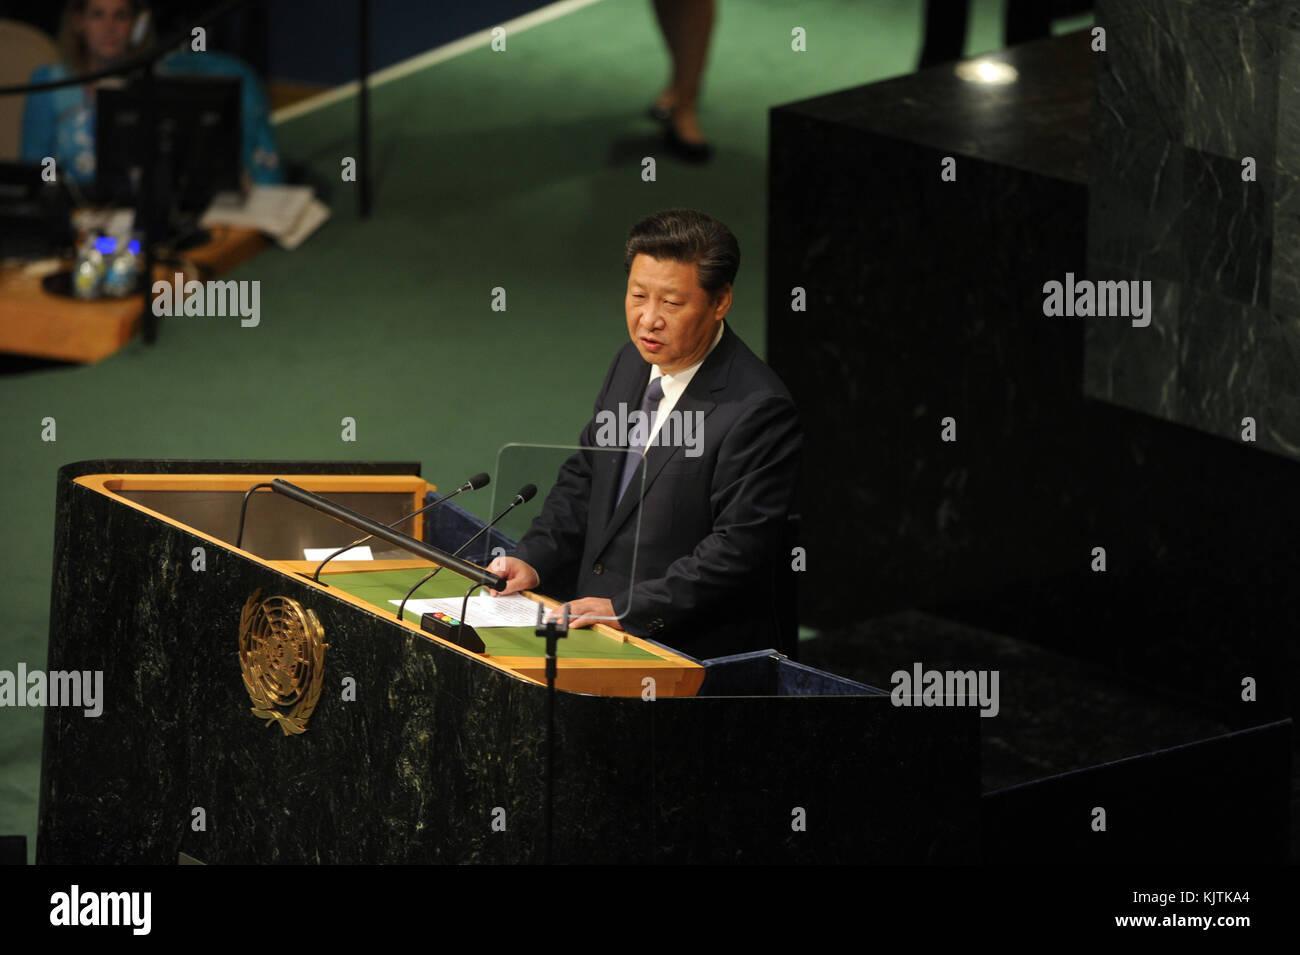 NEW YORK, NY - SEPTEMBER 26: Secretary-General Ban Ki-moon greets Xi Jinping, President of the People's Republic - Stock Image